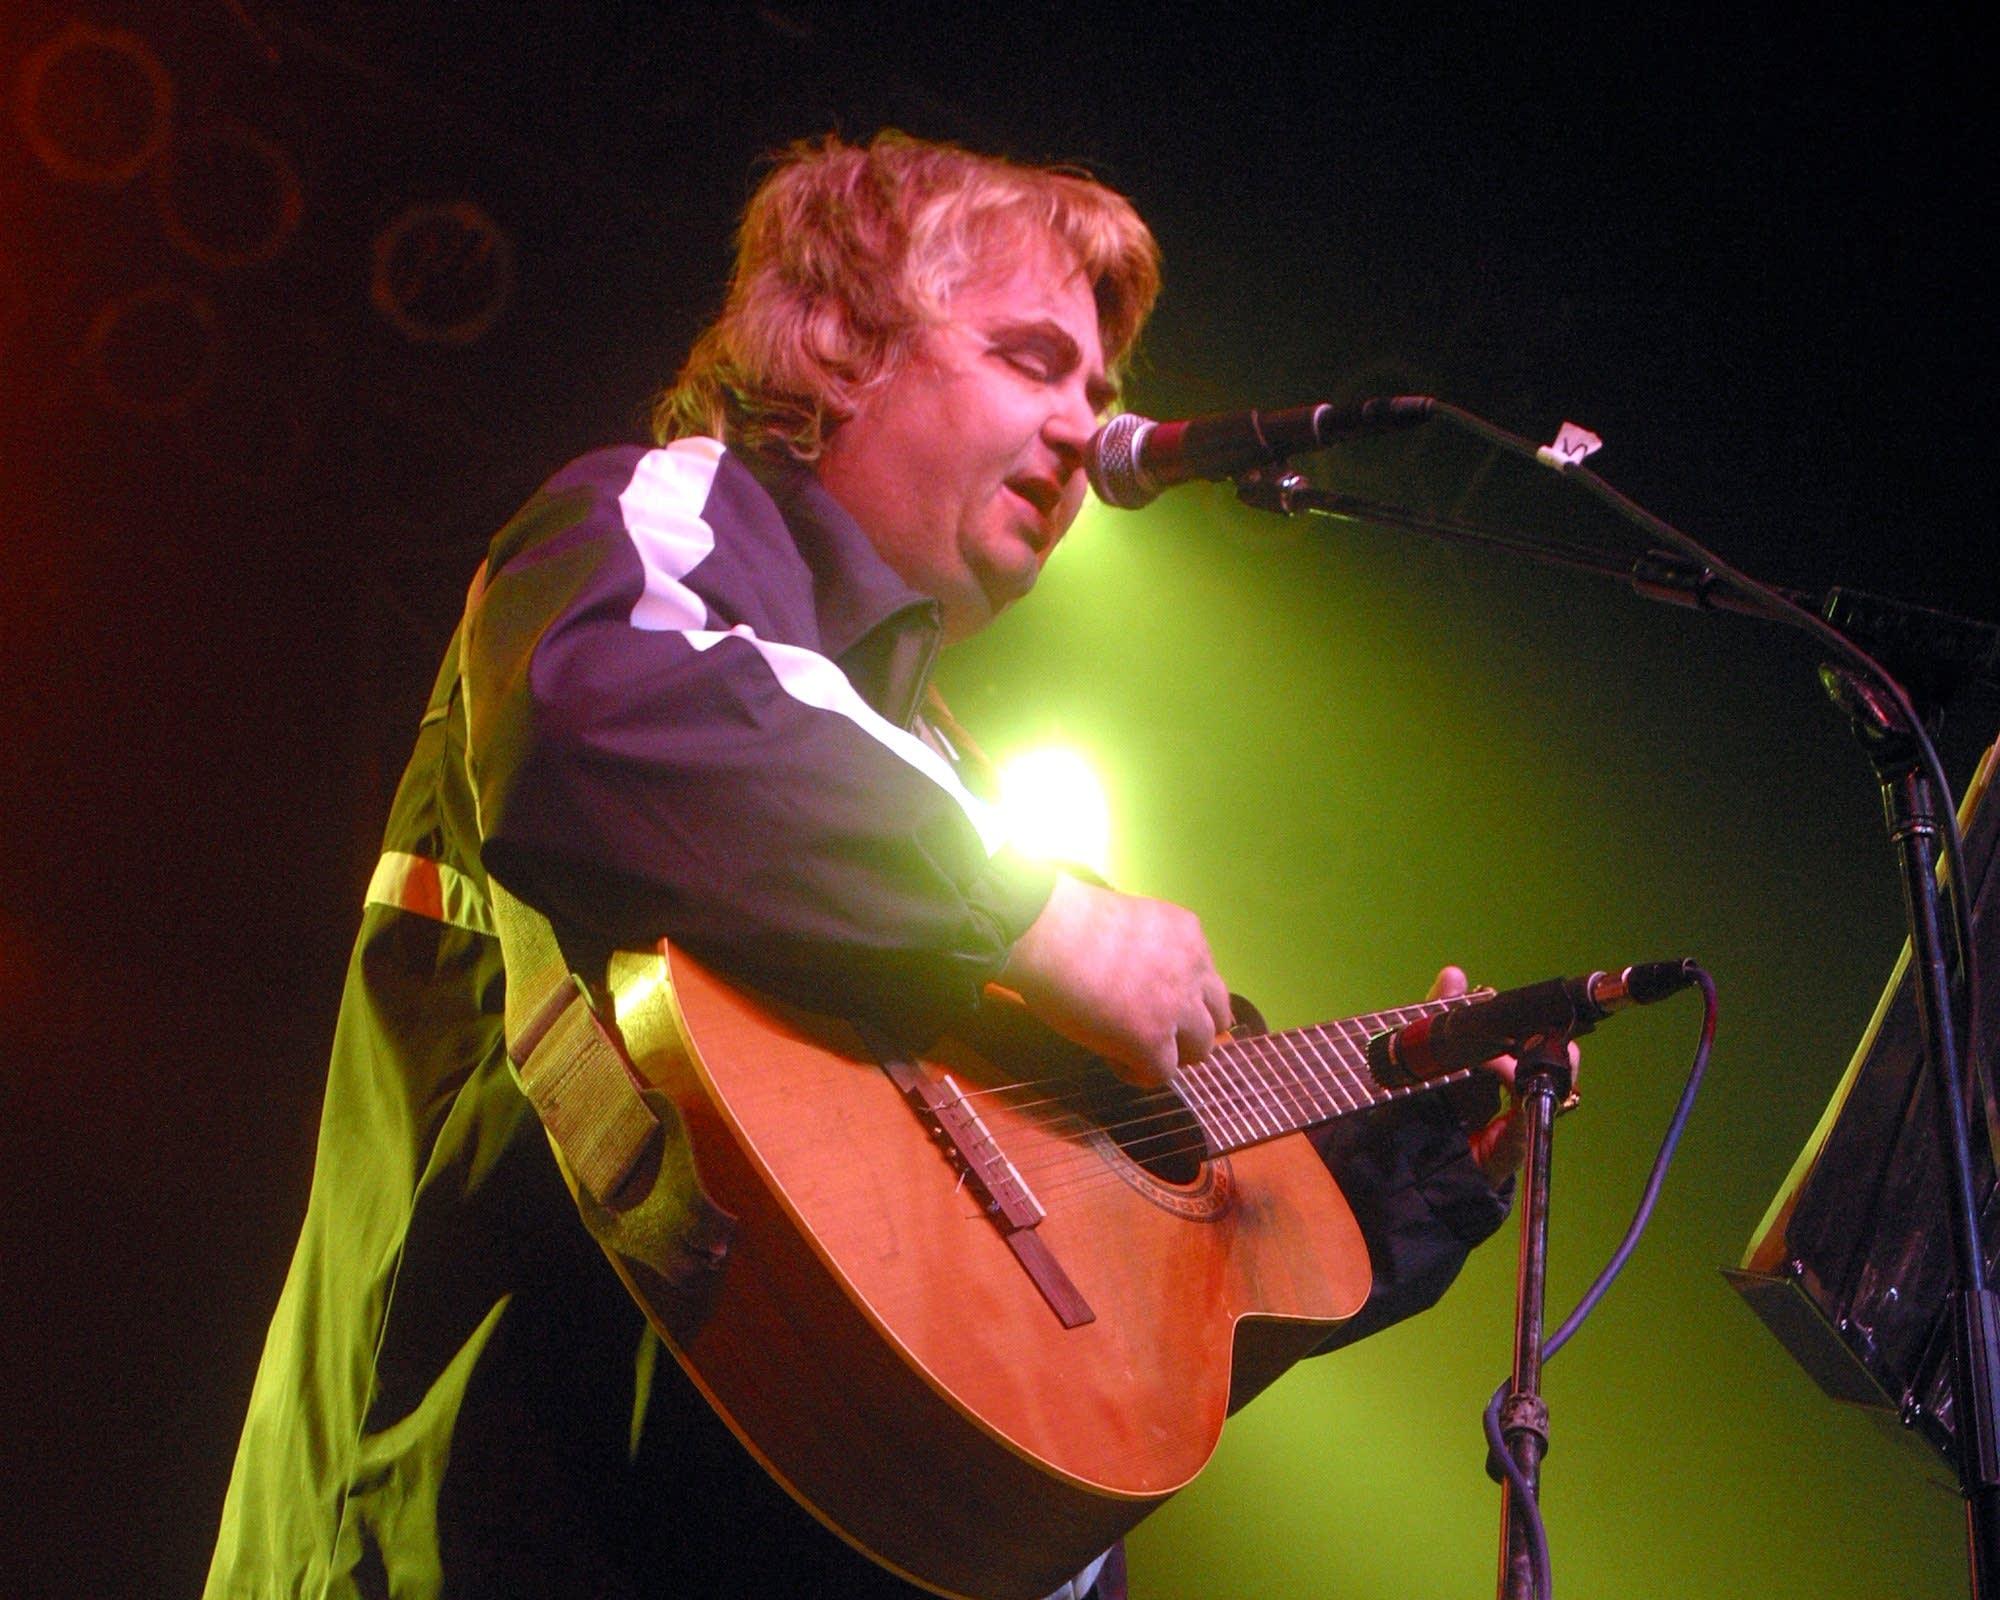 Daniel Johnston performing at SXSW 2005